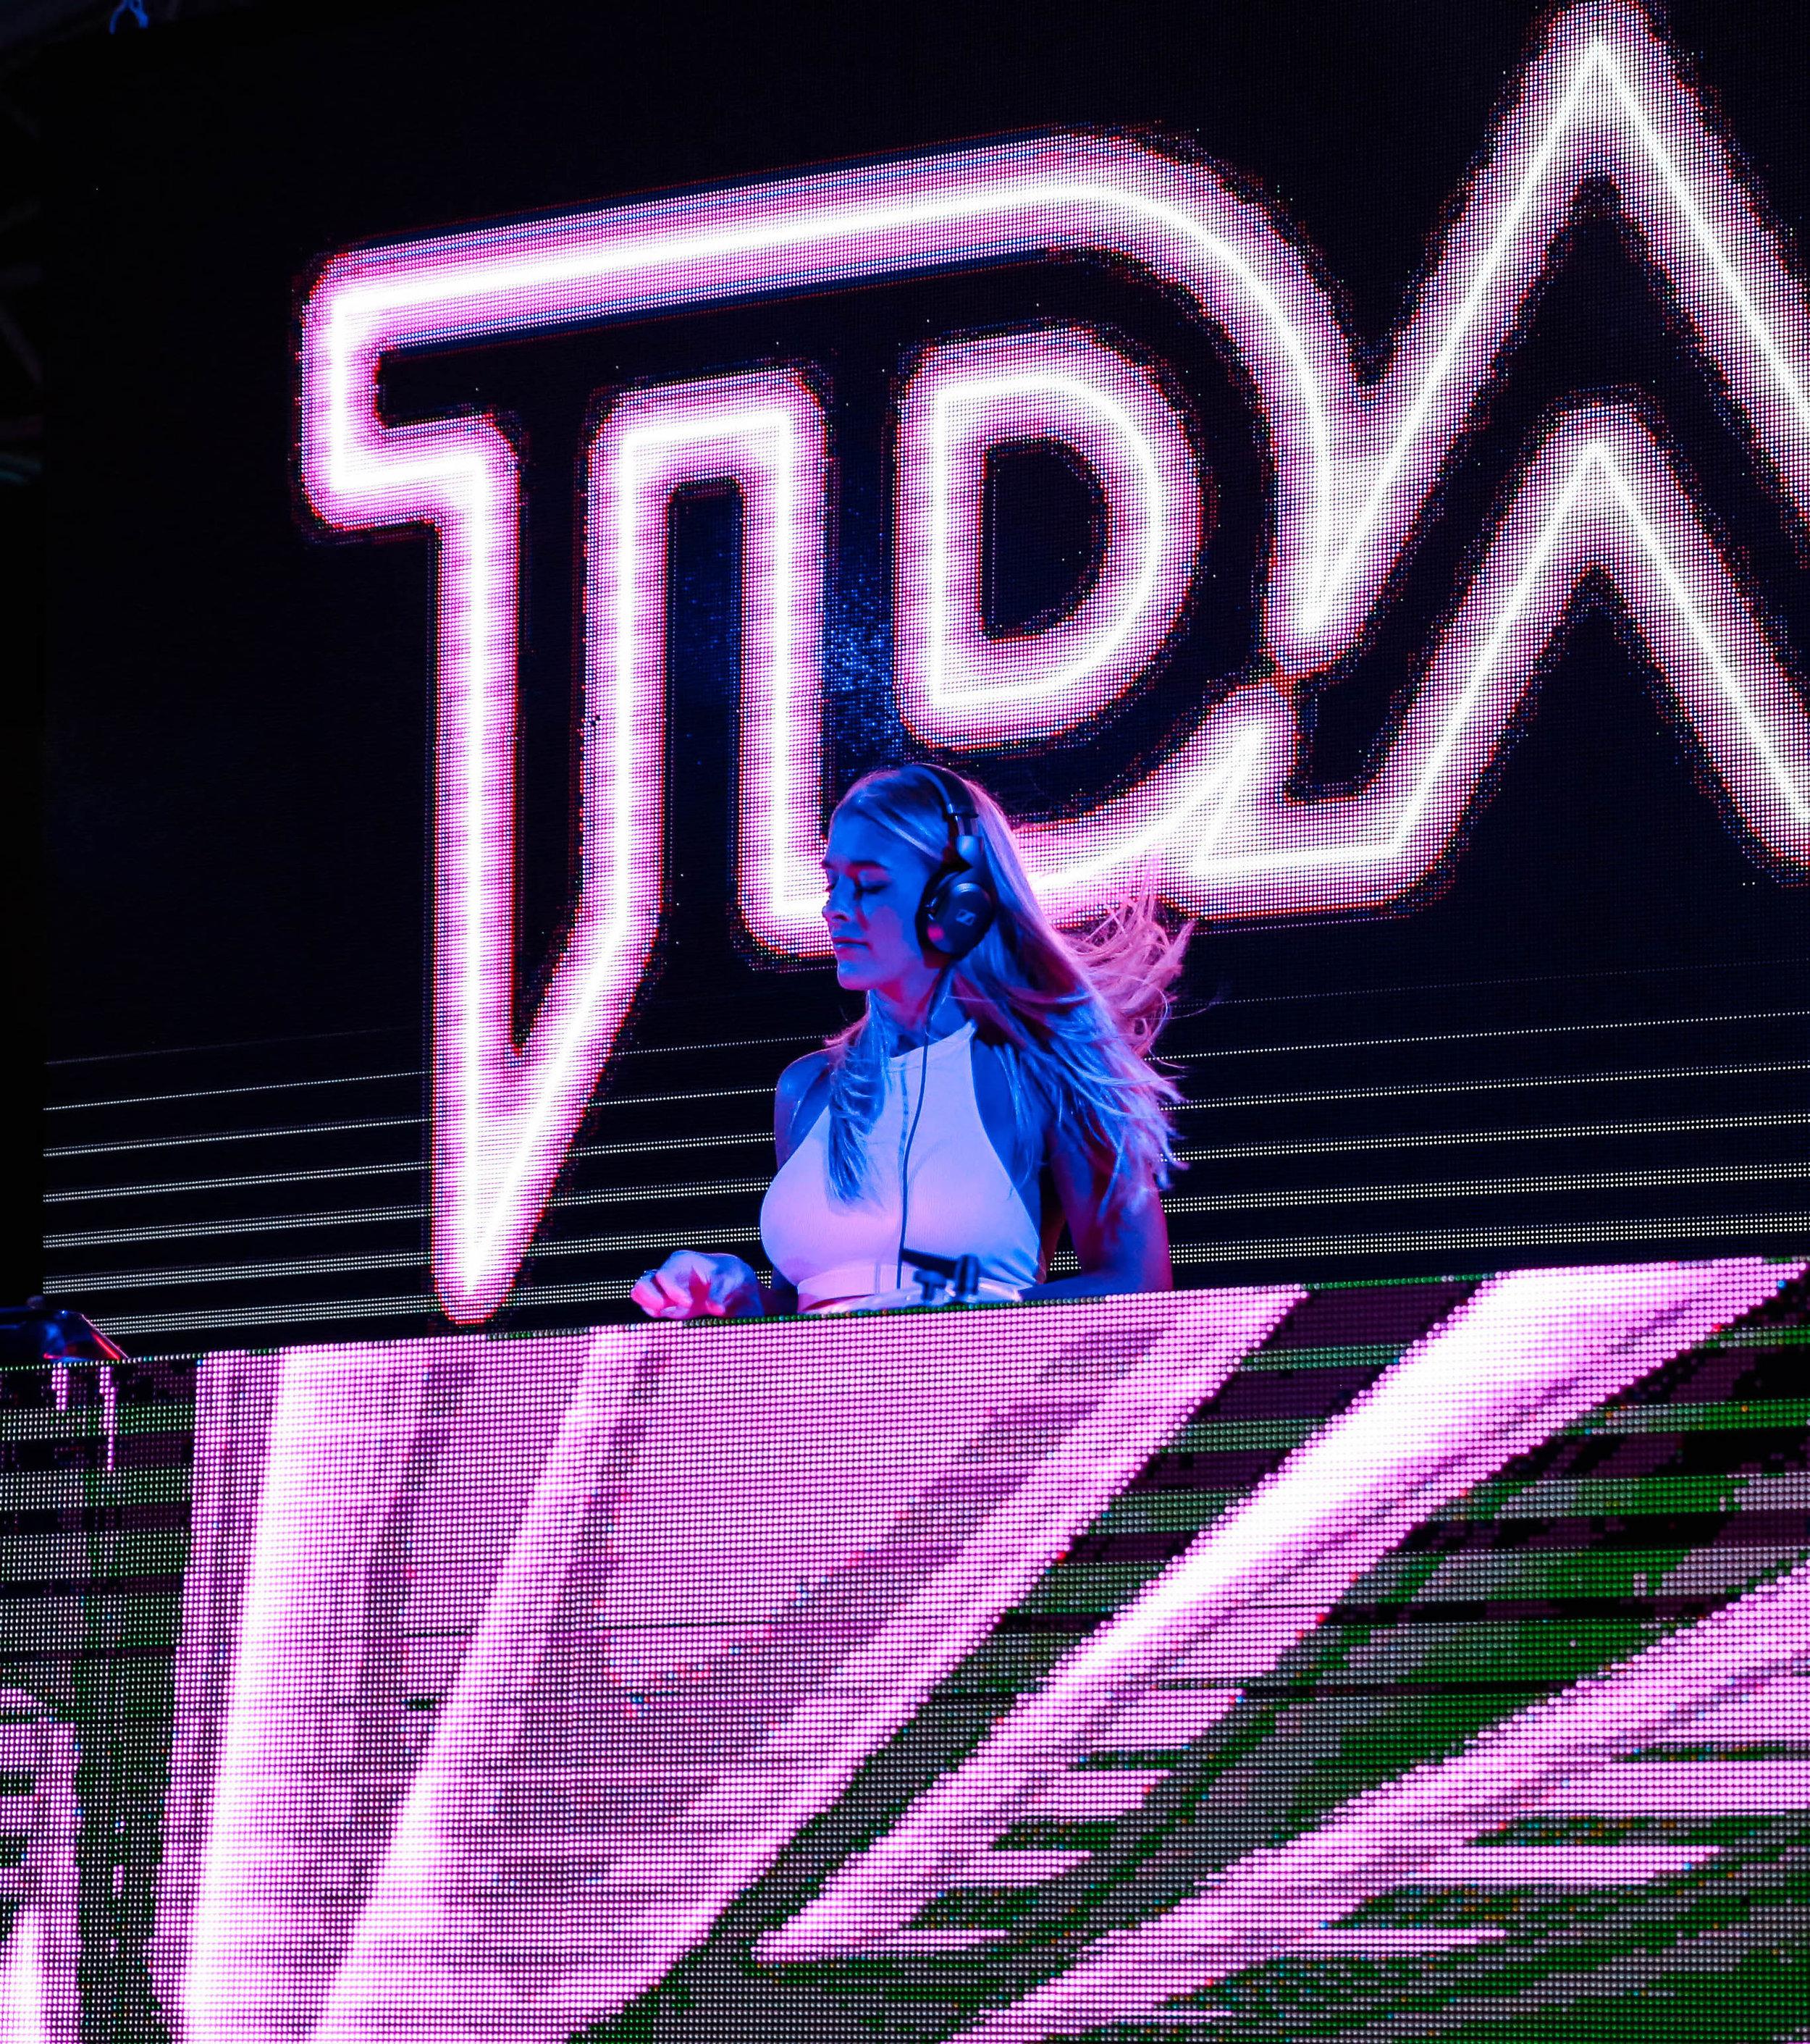 3 - TDade SLS Brickell Miami FL Tricia Dade DJ T.Dade-0663 copy 3.jpg